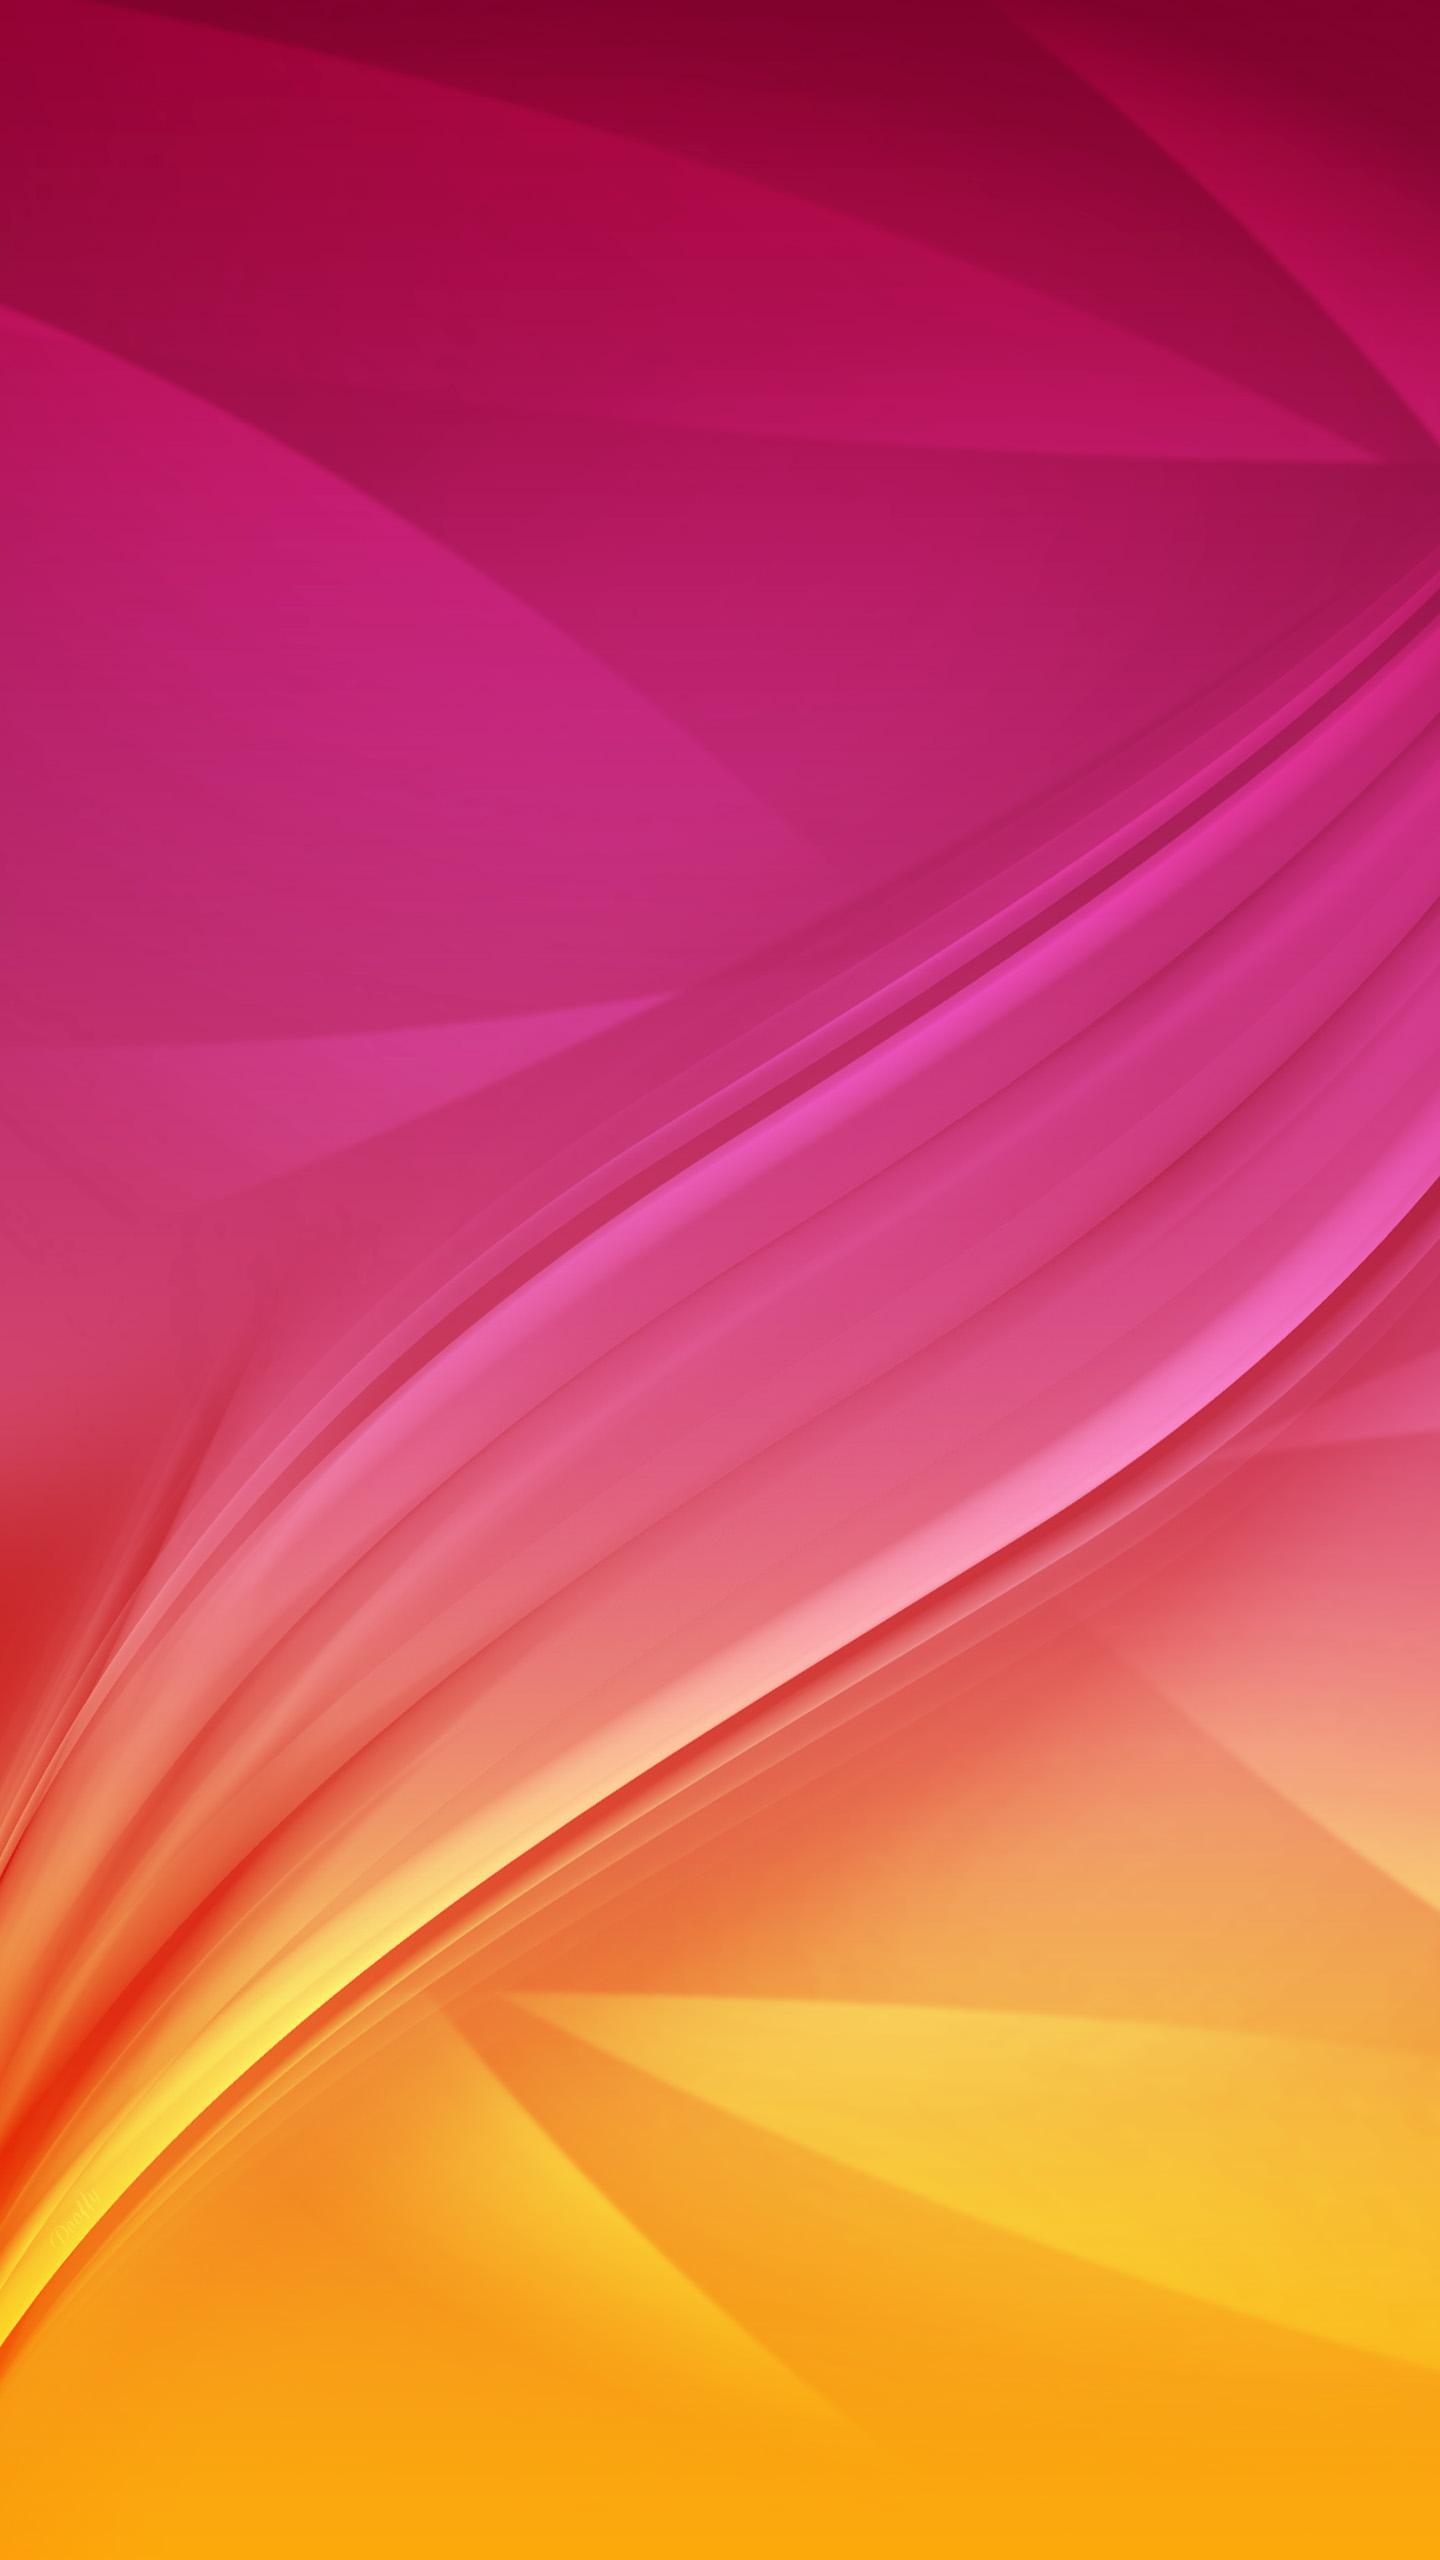 Wallpaper Samsung Galaxy S6 - Colours (by Dooffy) by Dooffy-Design on DeviantArt